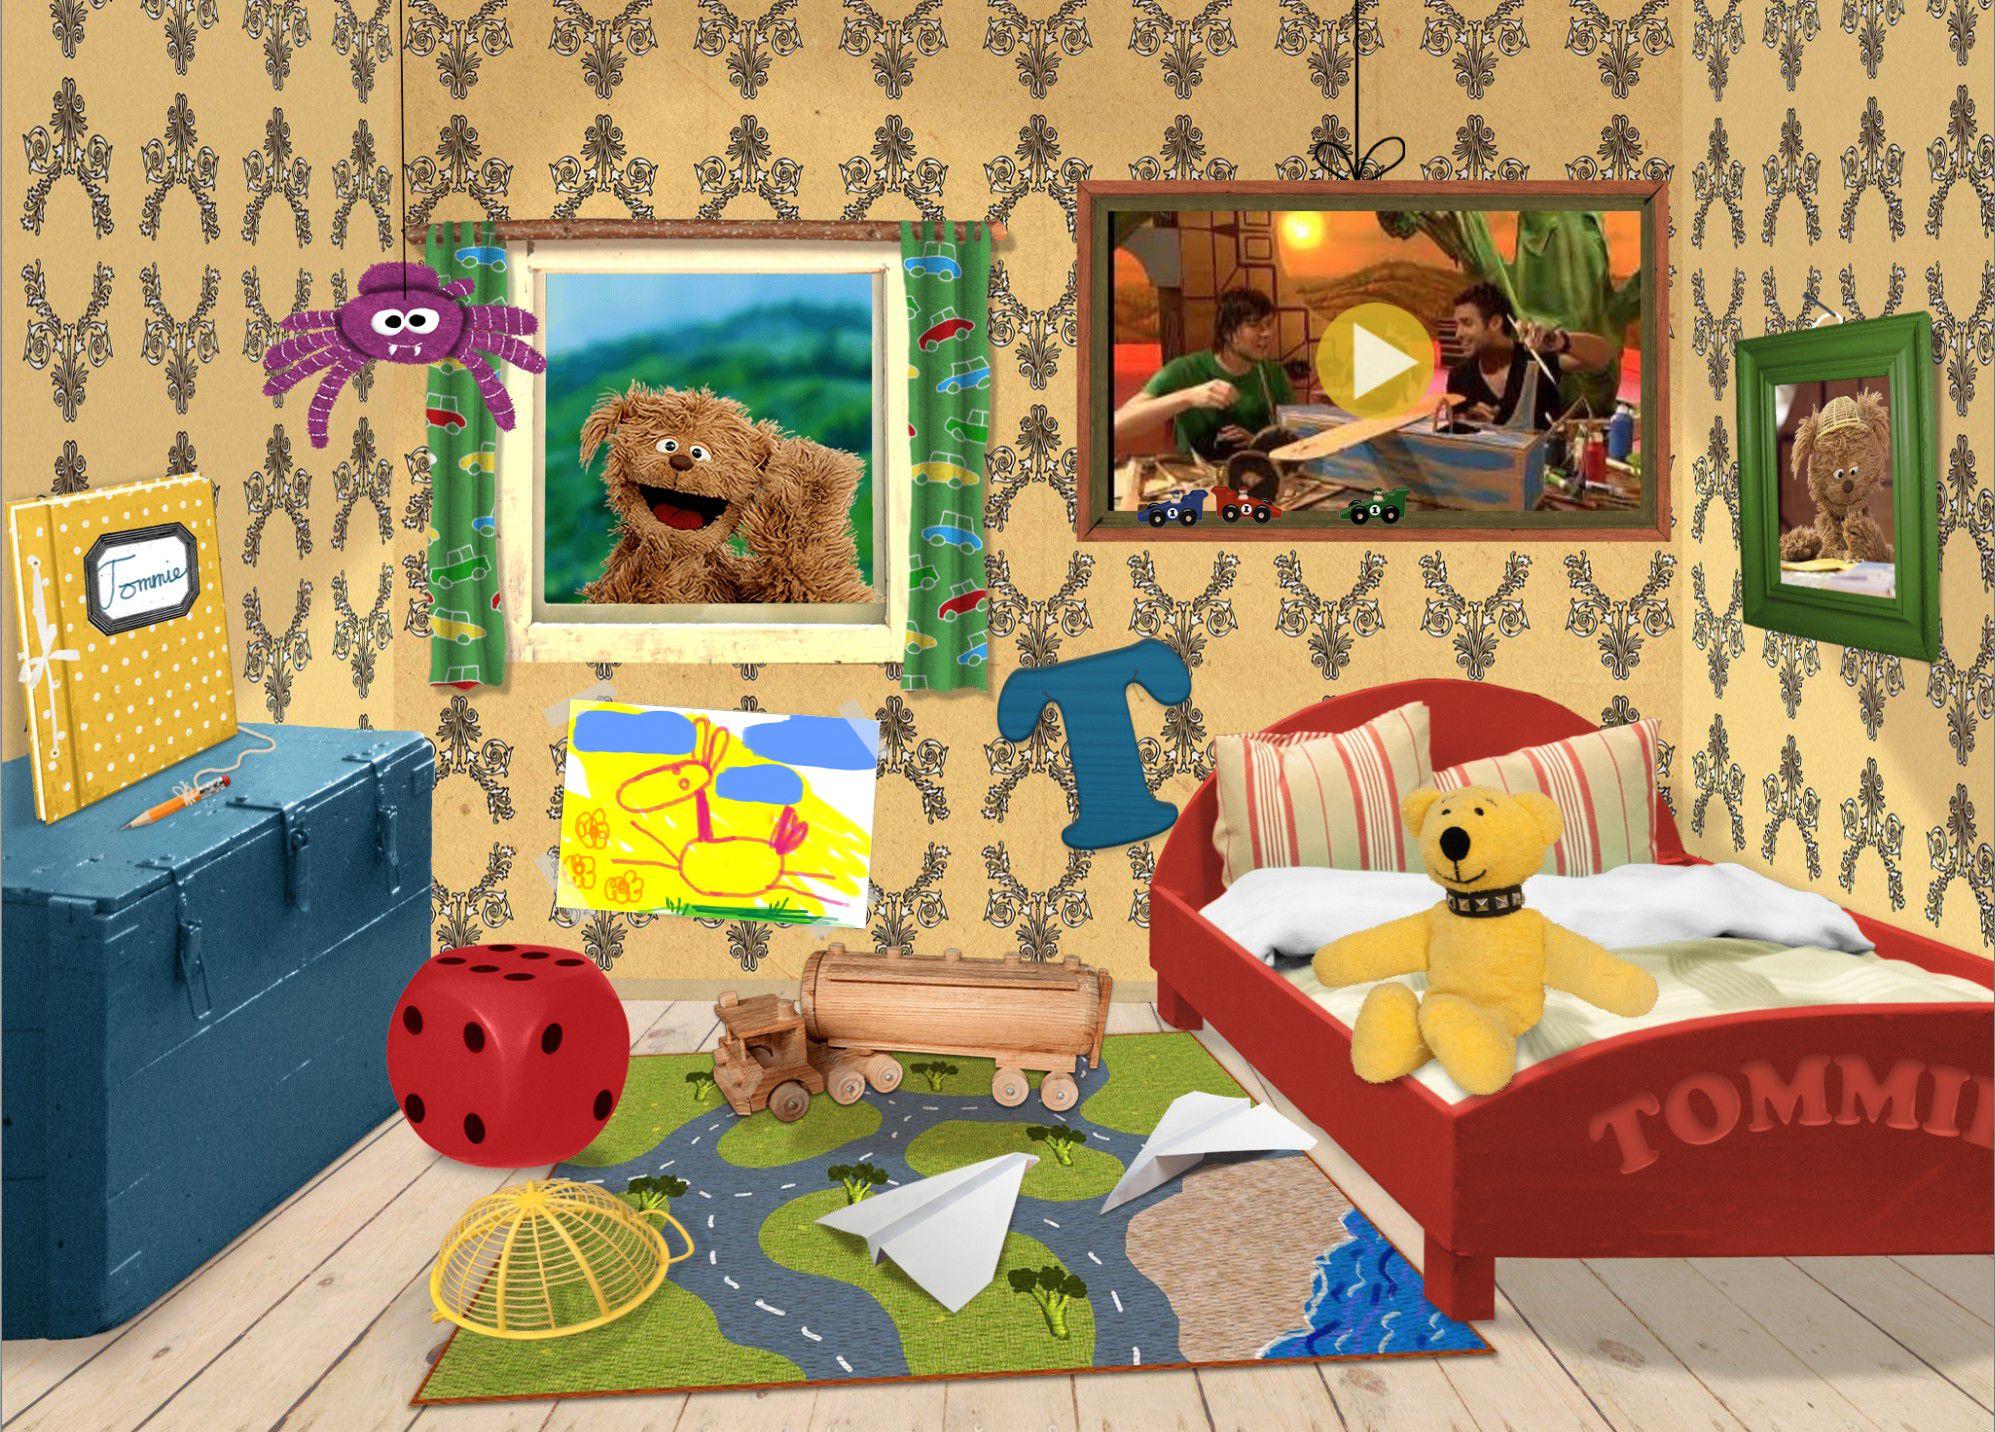 Speel spelletjes samen met tommie - Kamer van water in de kamer ...